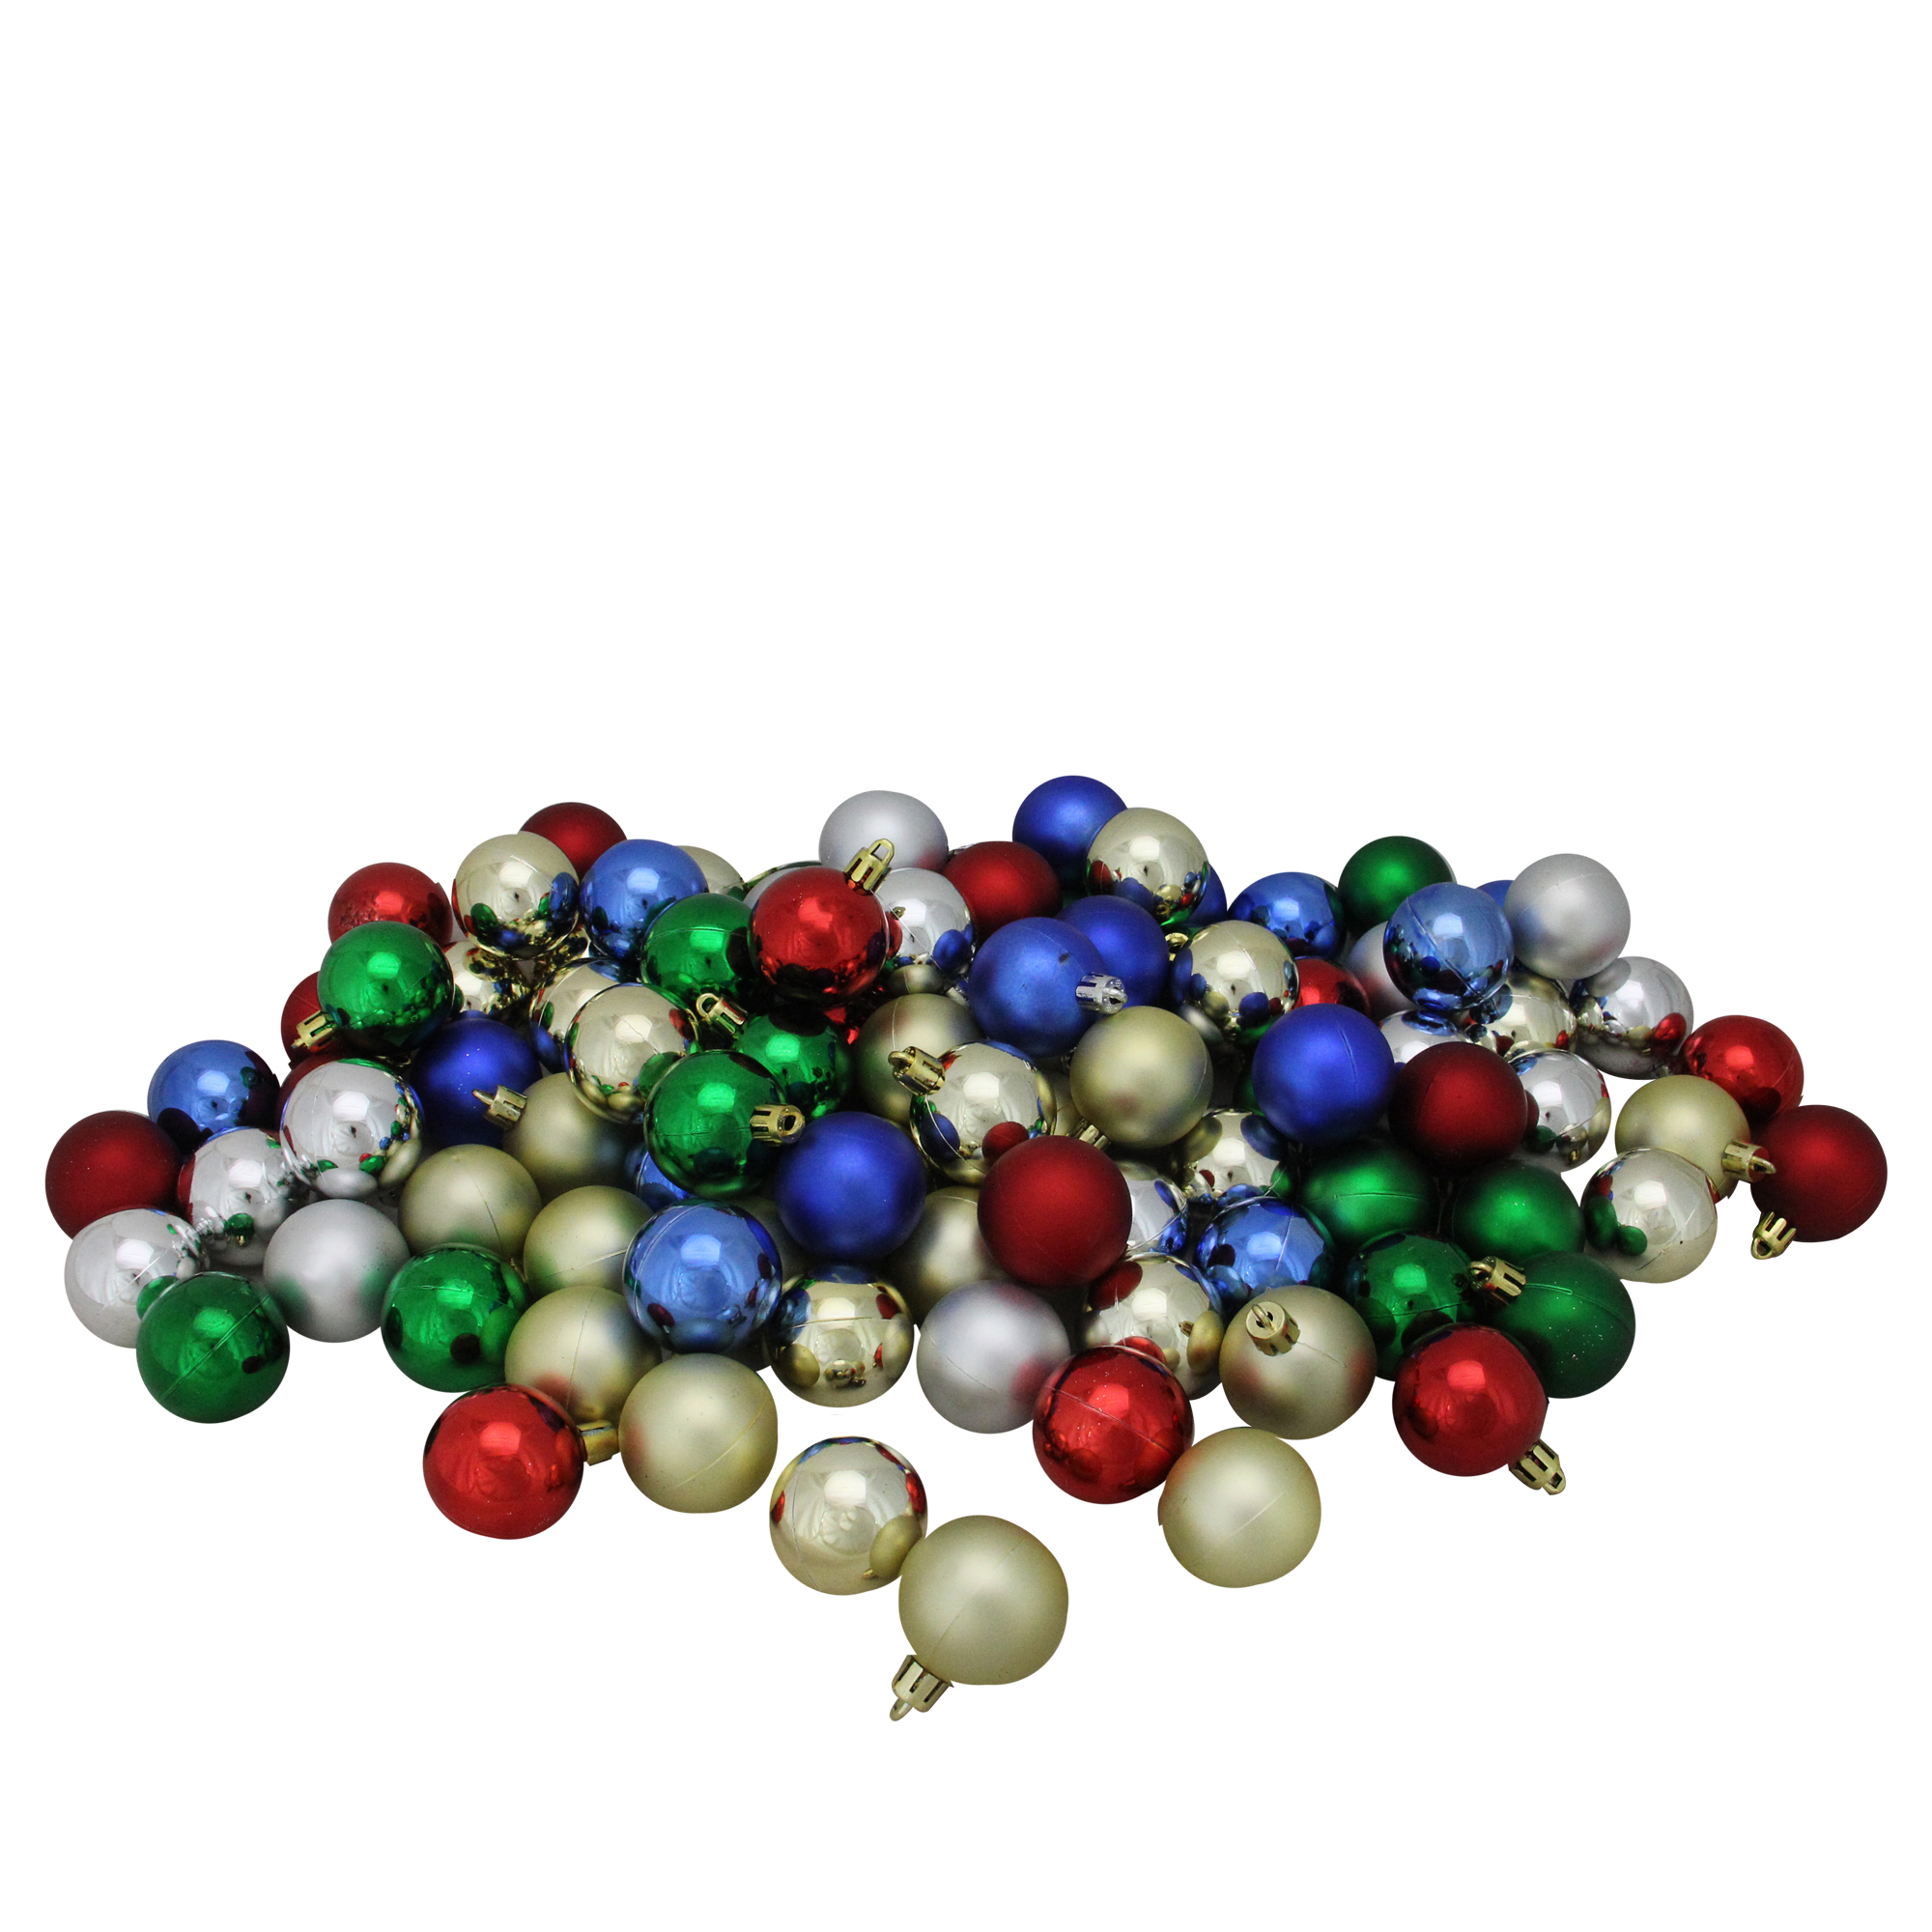 NORTHLIGHT 20ct Shatterproof Multi Color Shiny & Matte Christmas ...